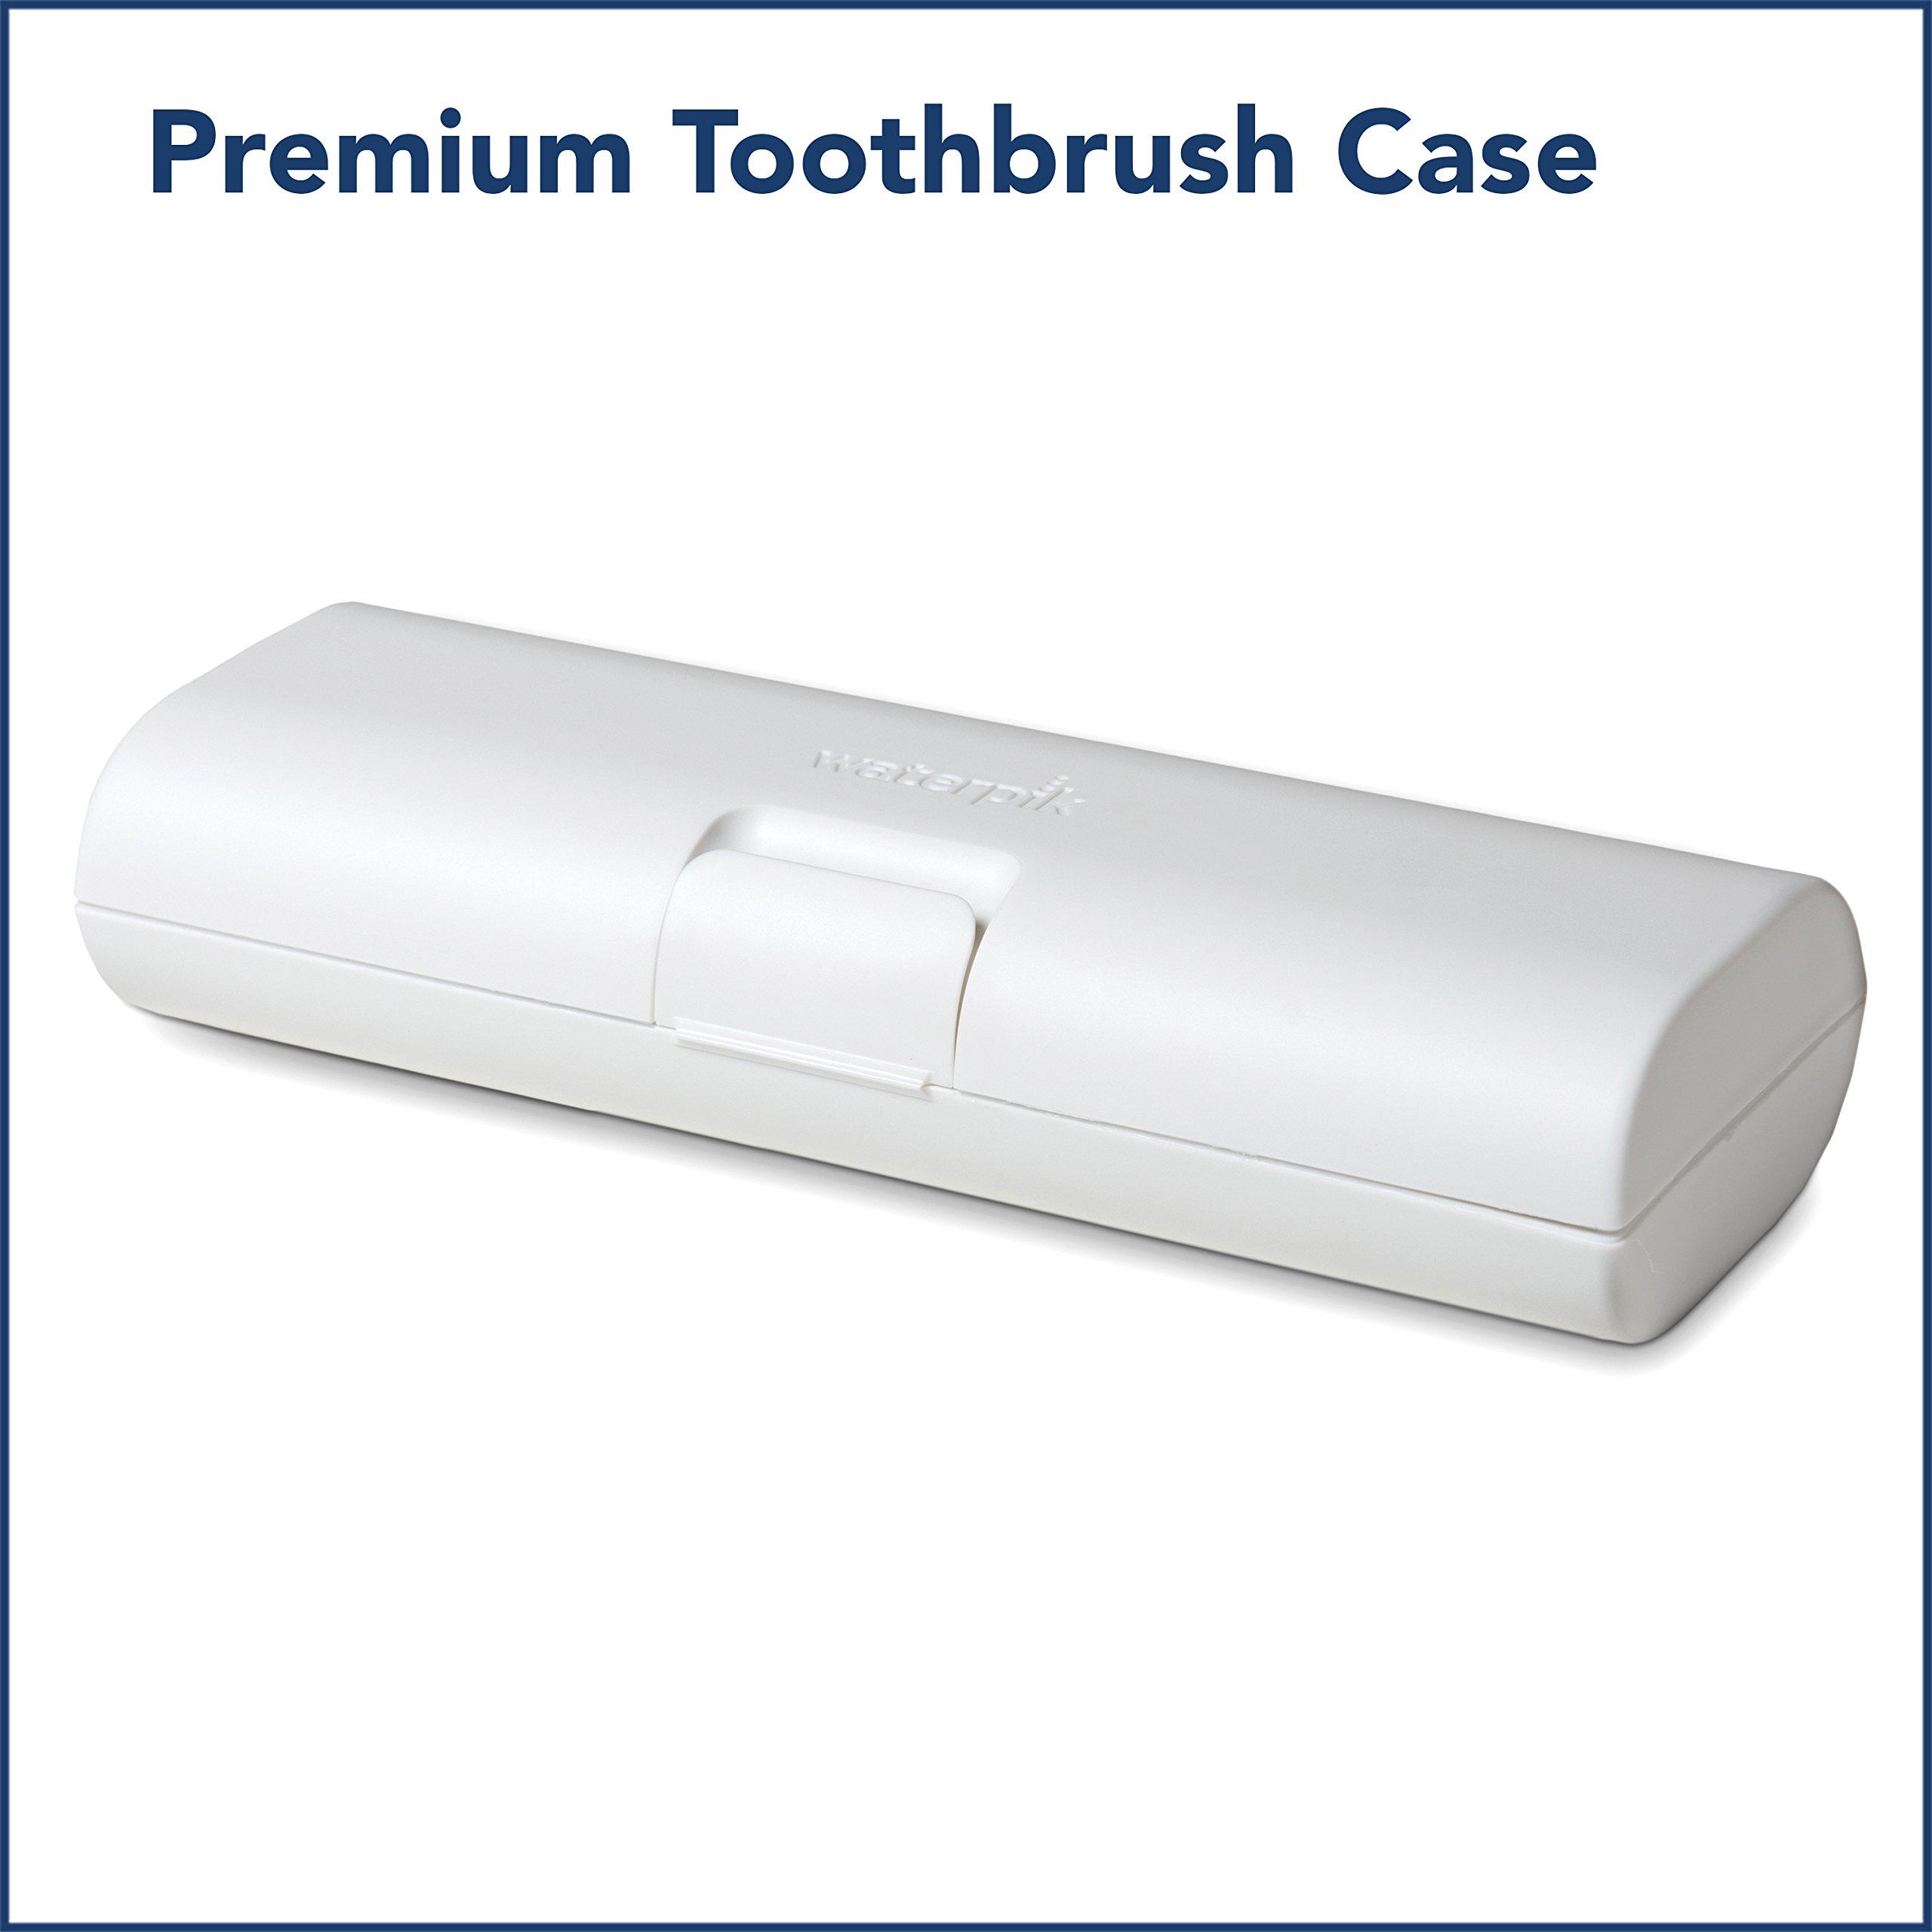 Waterpik Complete Care 9.0 Sonic Electric Toothbrush + Water Flosser, White by Waterpik (Image #16)